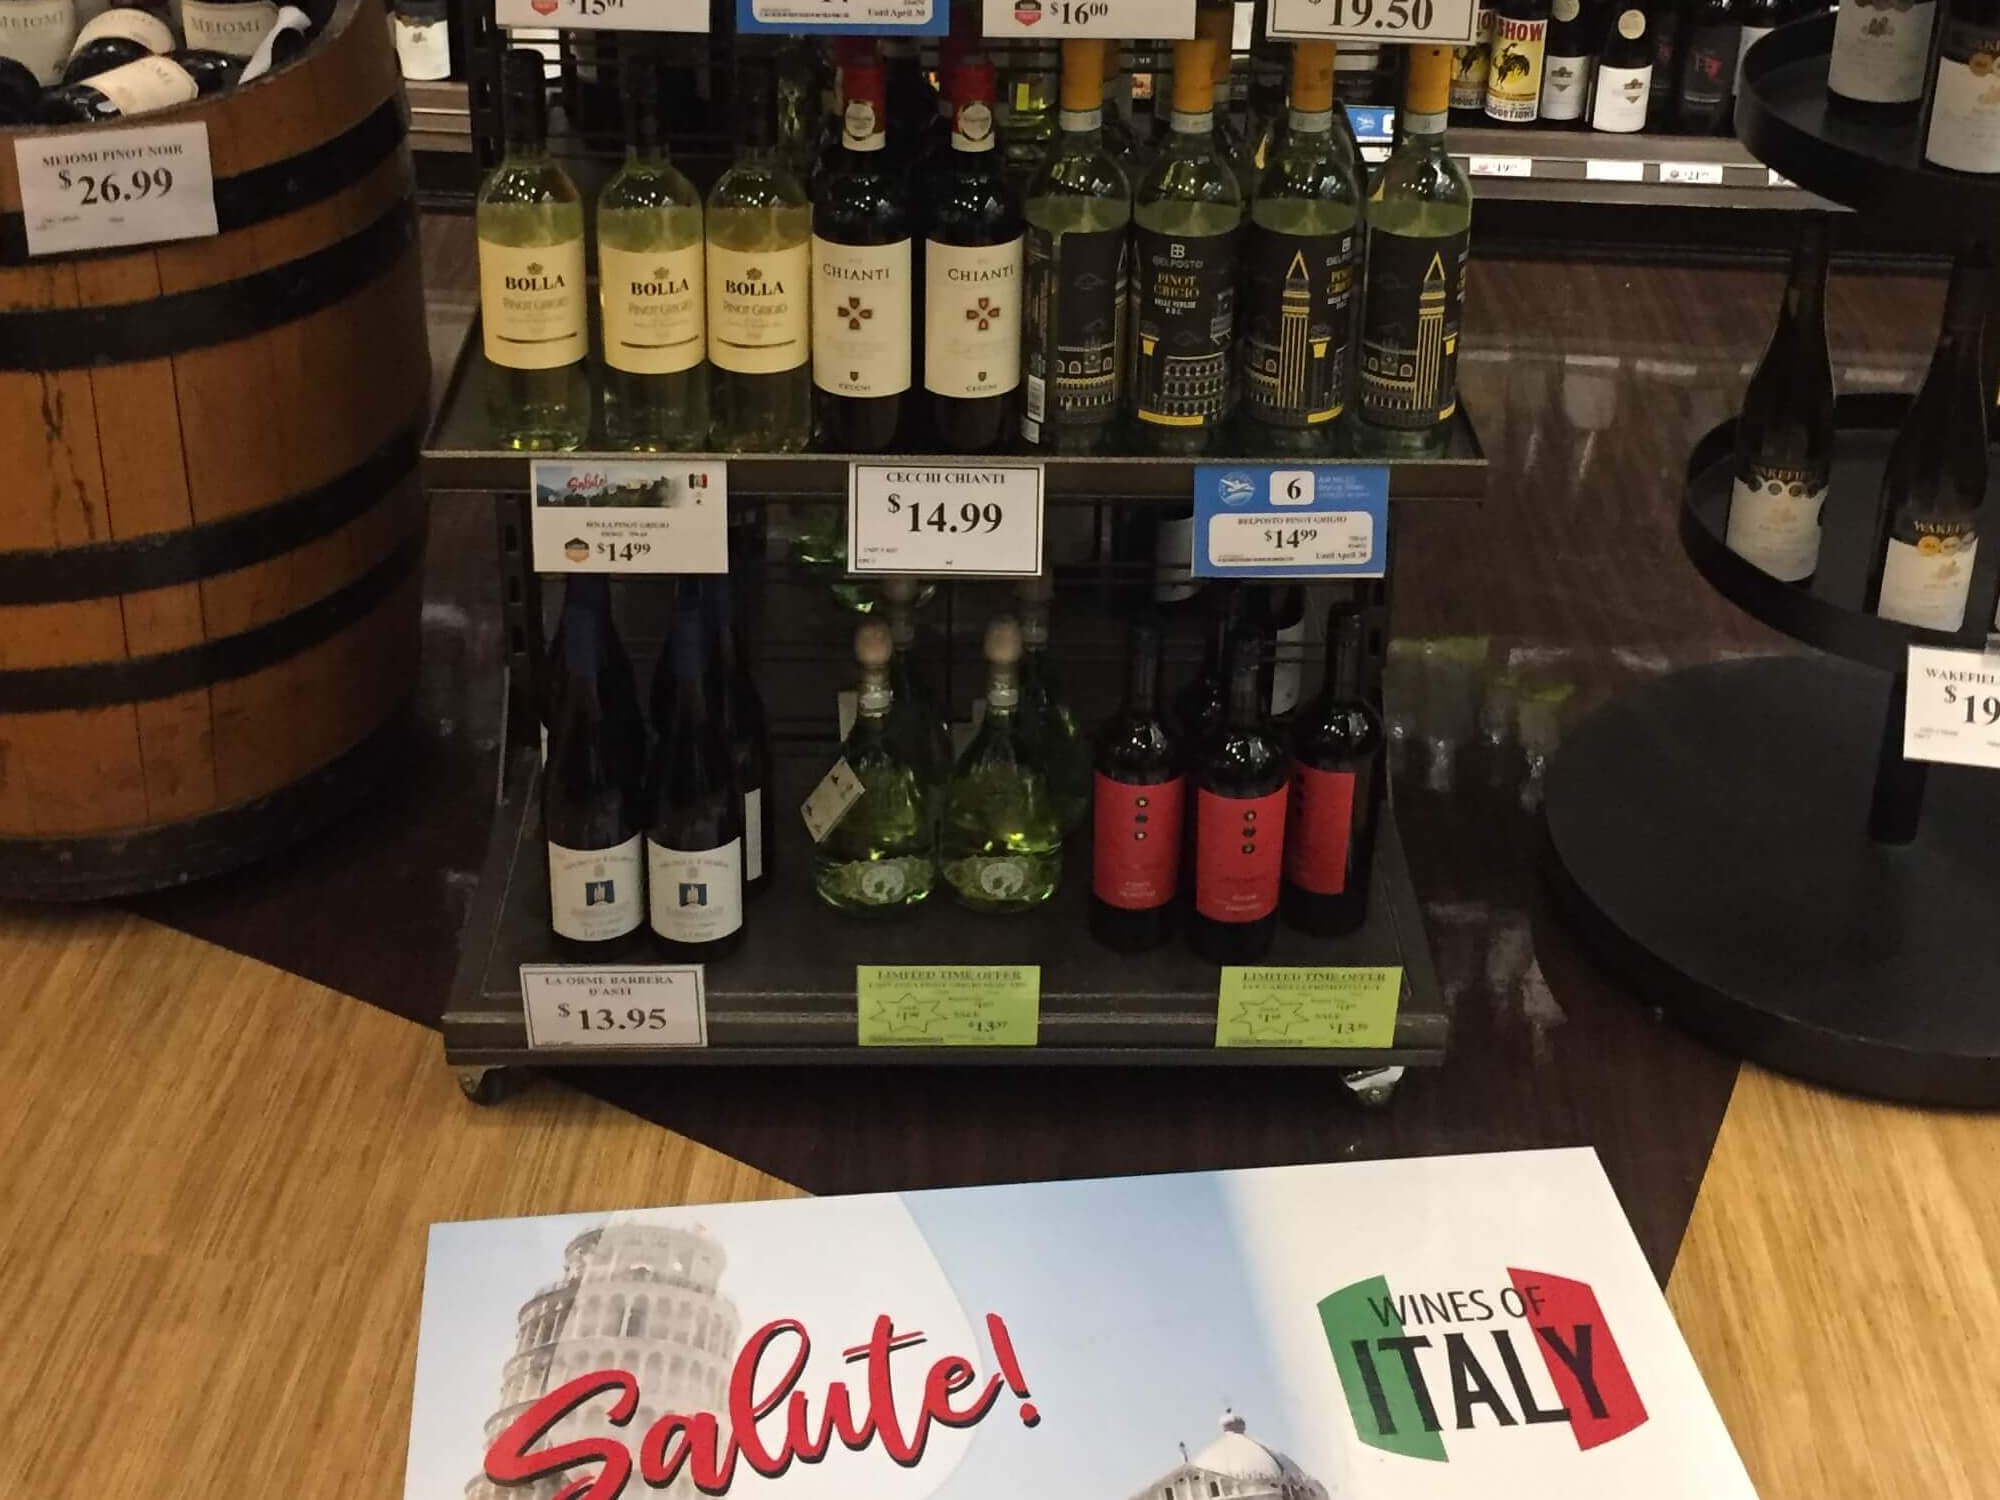 Emerging Wines Of Europe EU Chamber Of Commerce Wine Display